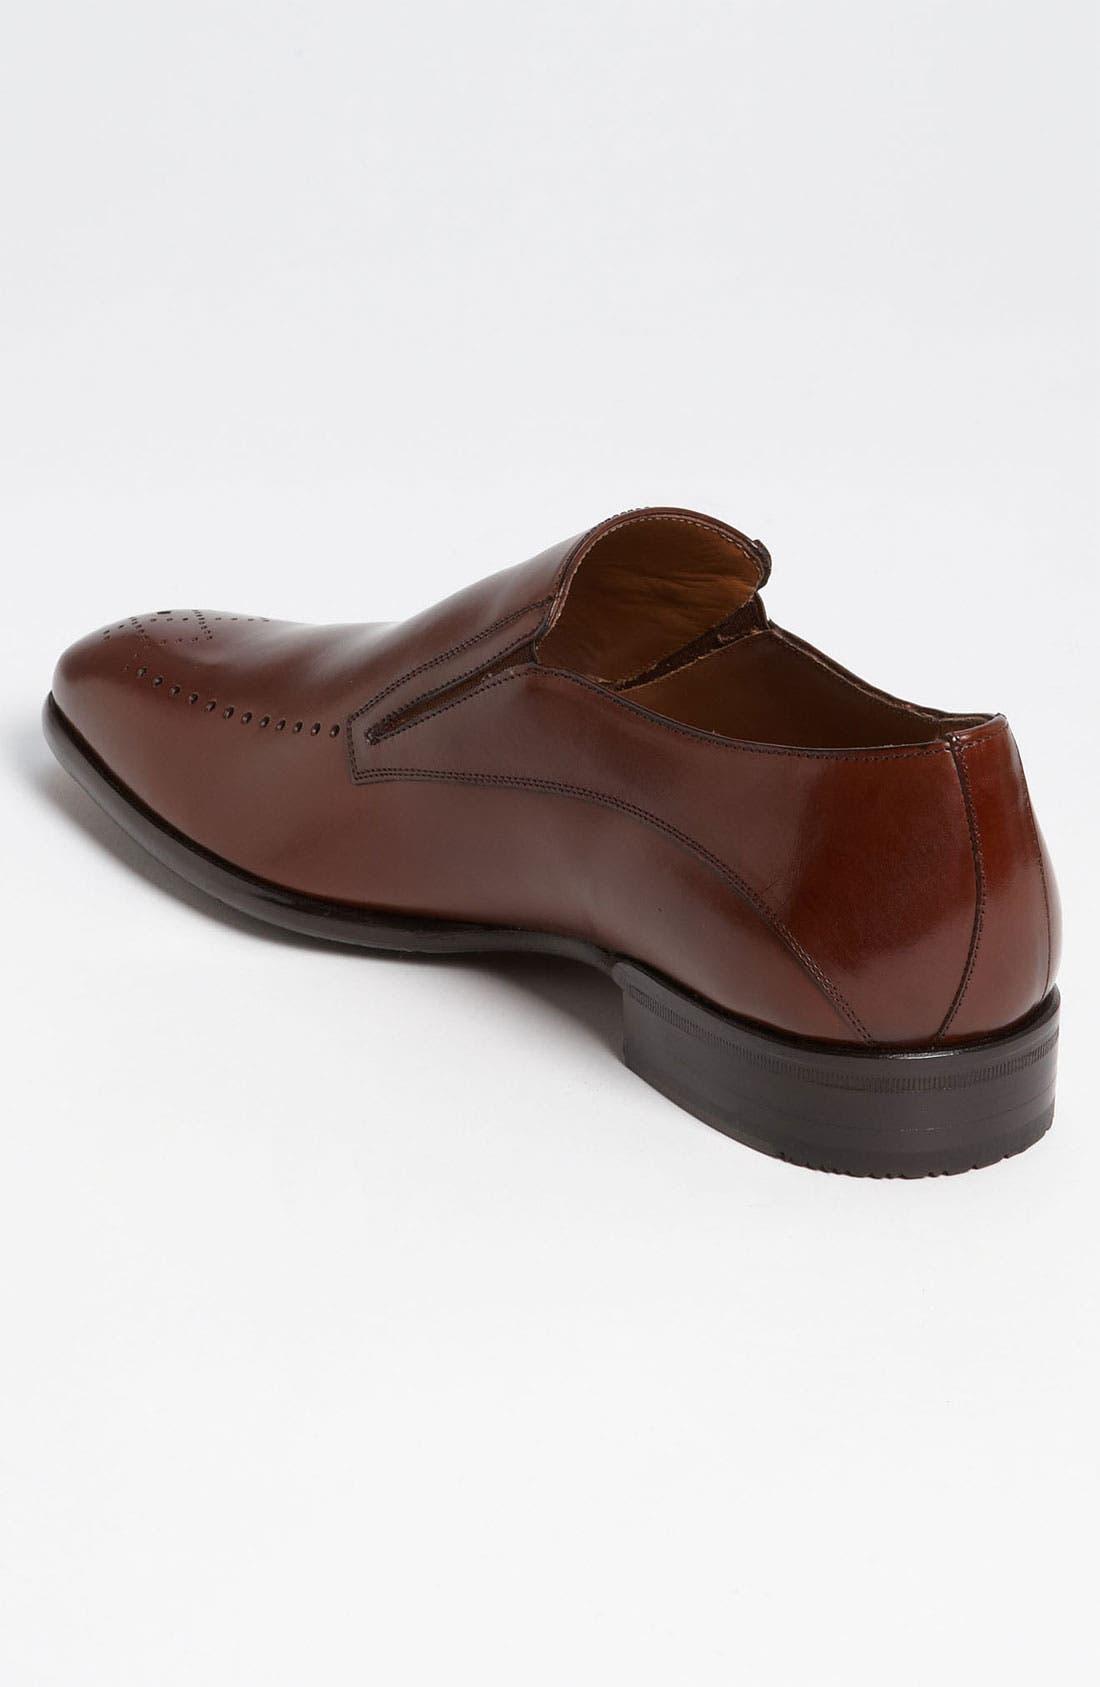 Alternate Image 2  - Mezlan 'Toscano' Venetian Loafer